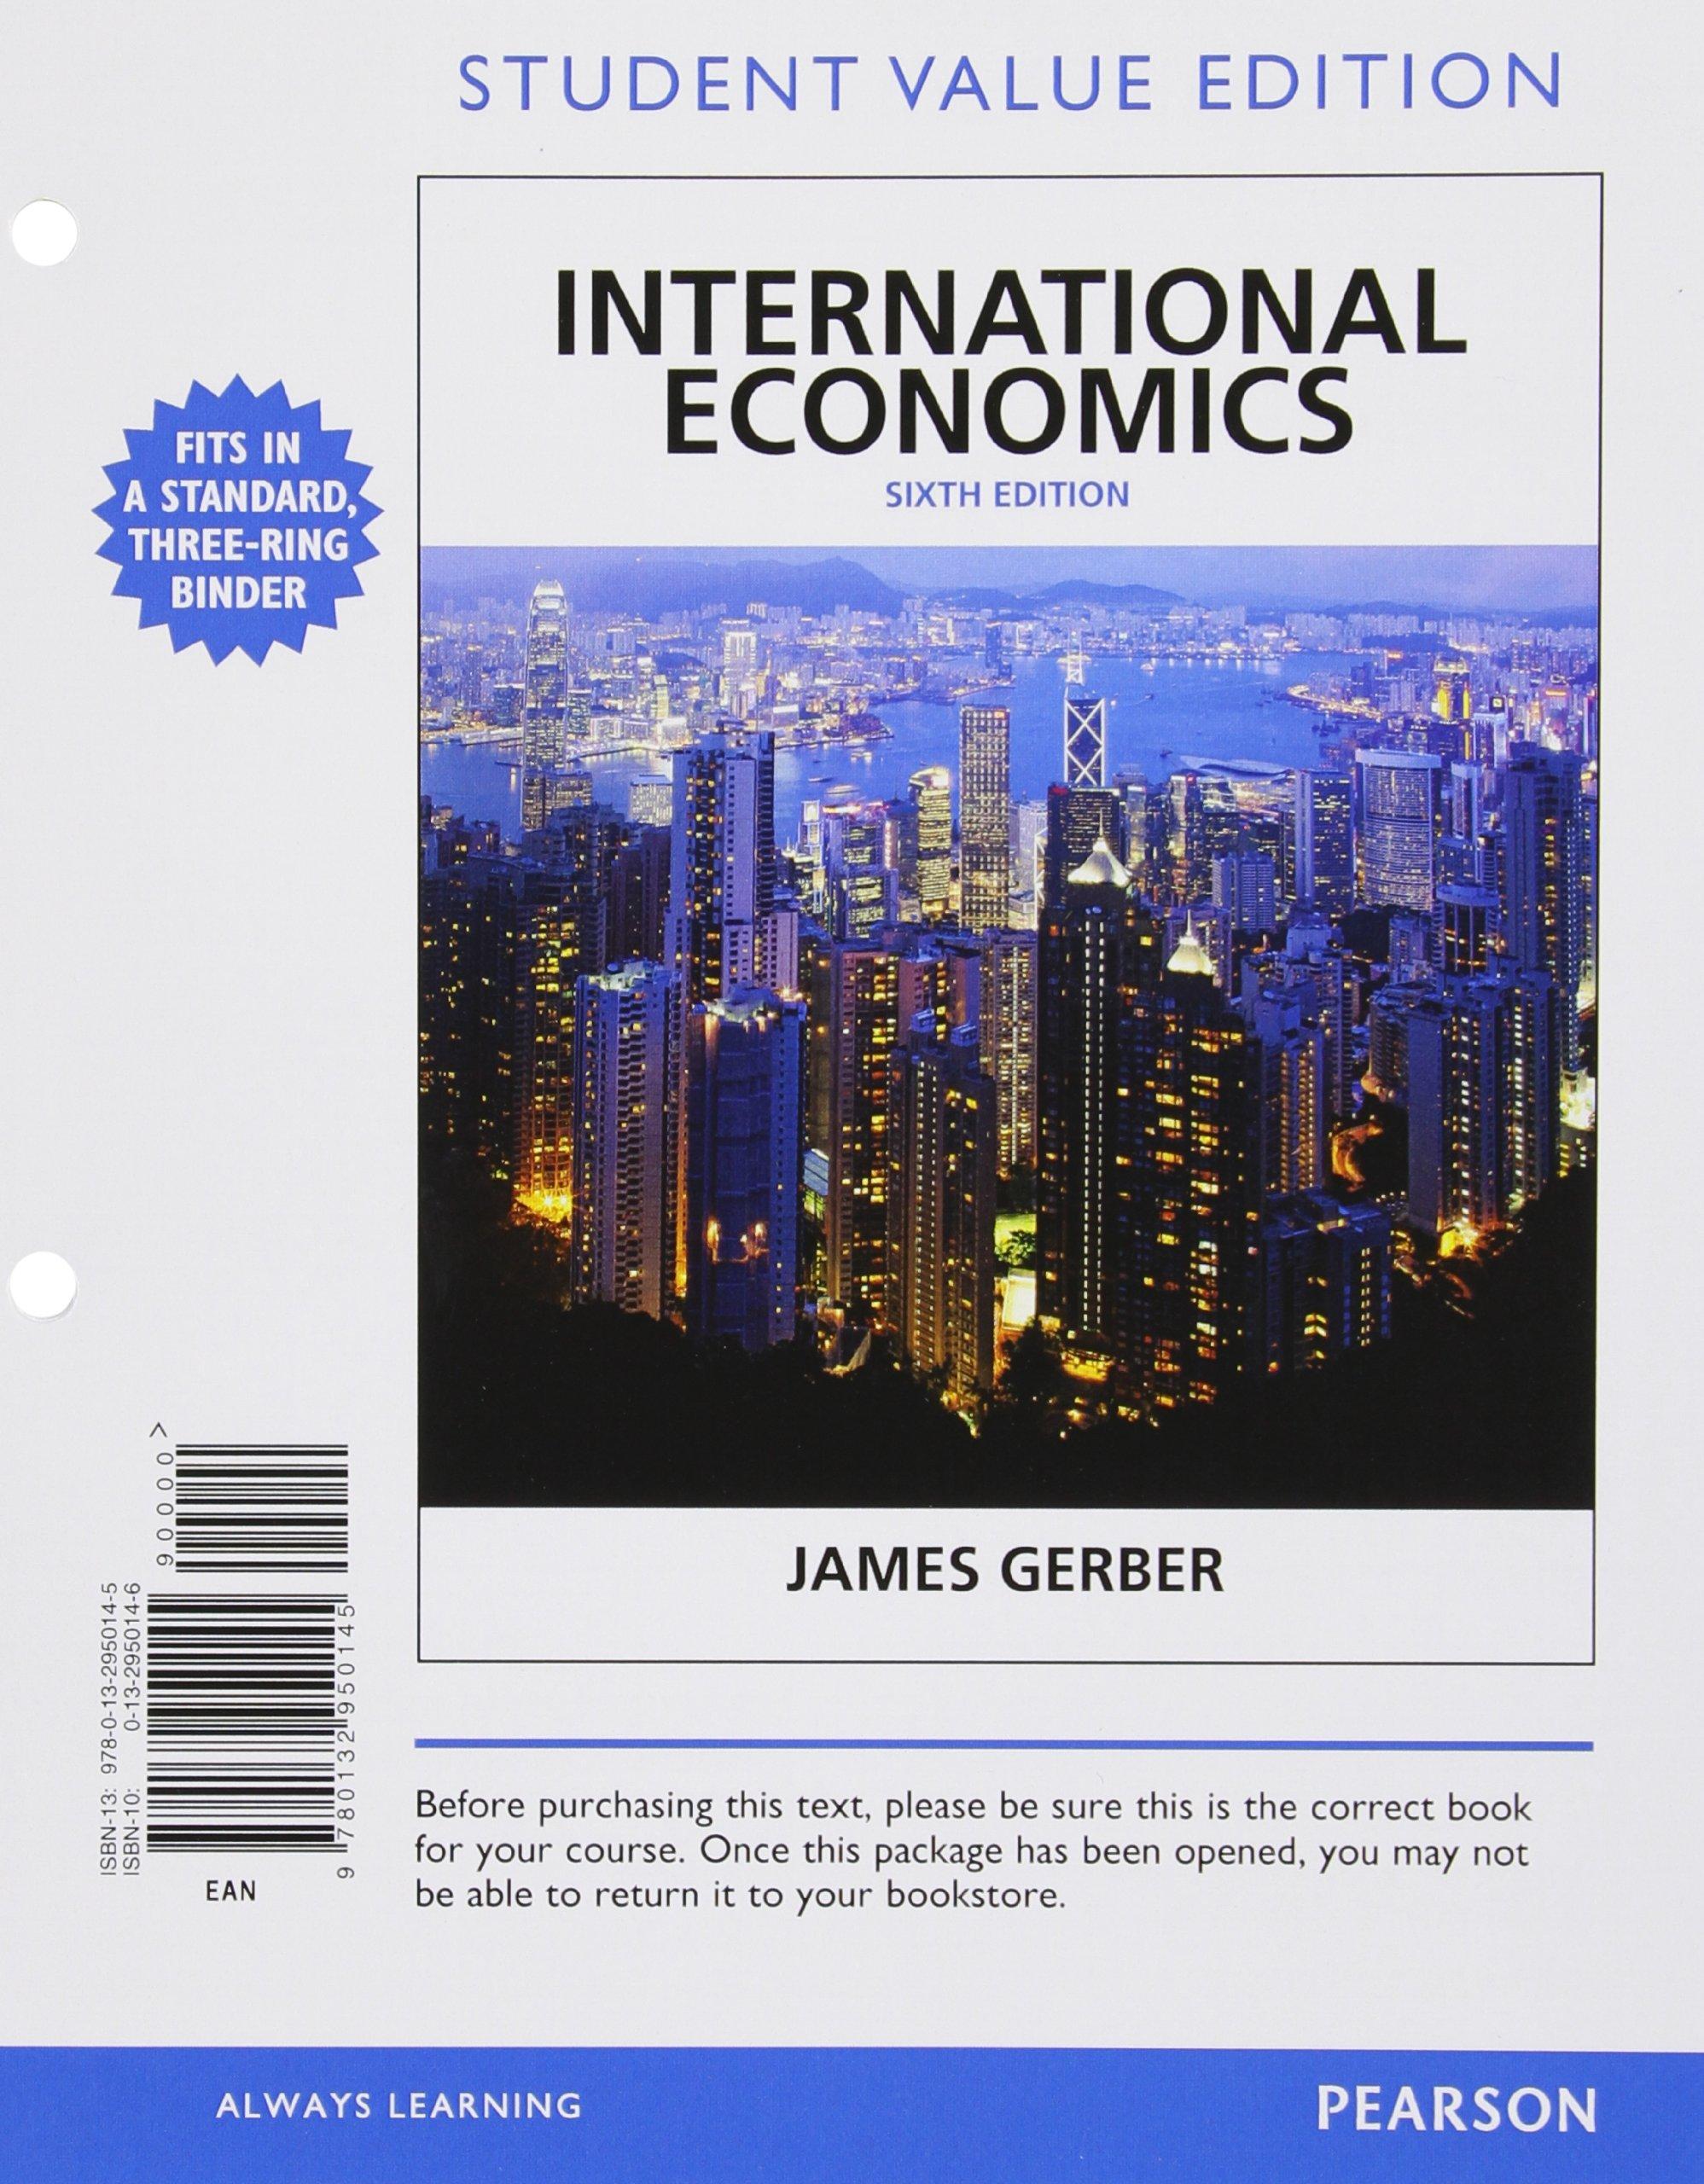 International economics student value edition 6th edition james international economics student value edition 6th edition james gerber 9780132950145 books amazon fandeluxe Gallery